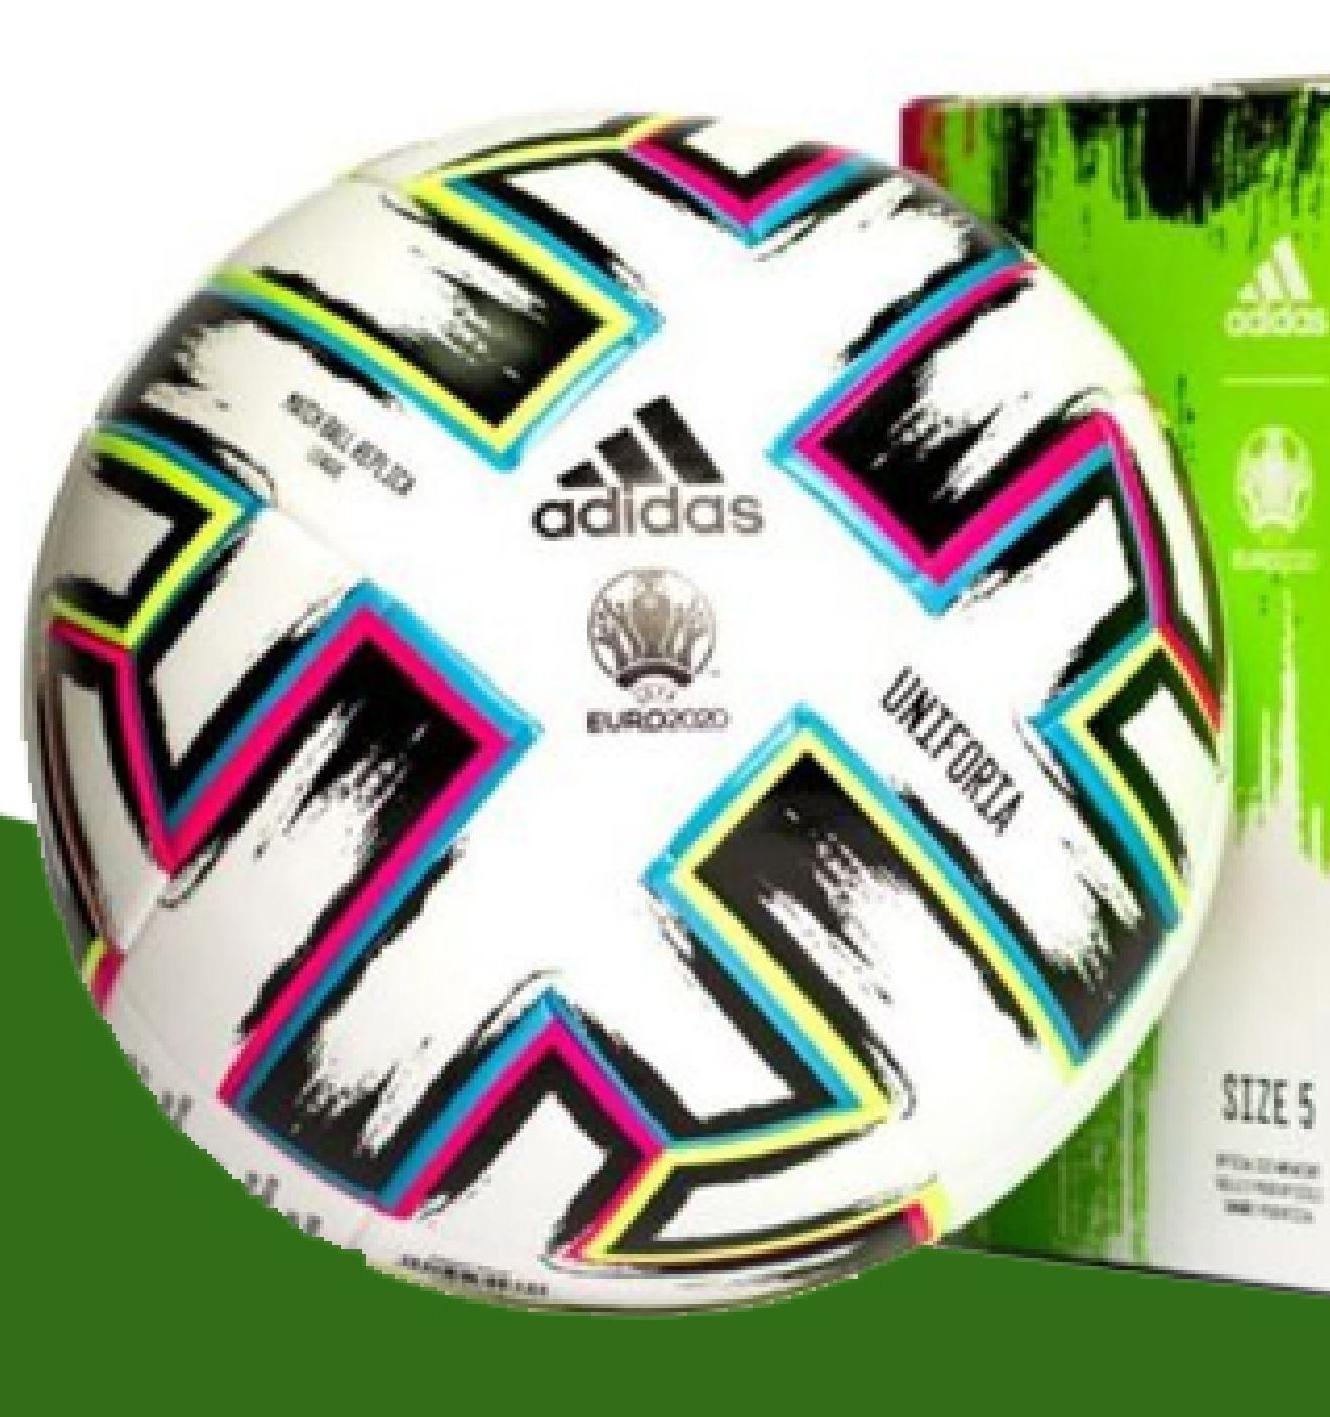 Piłka nożna Adidas niska cena